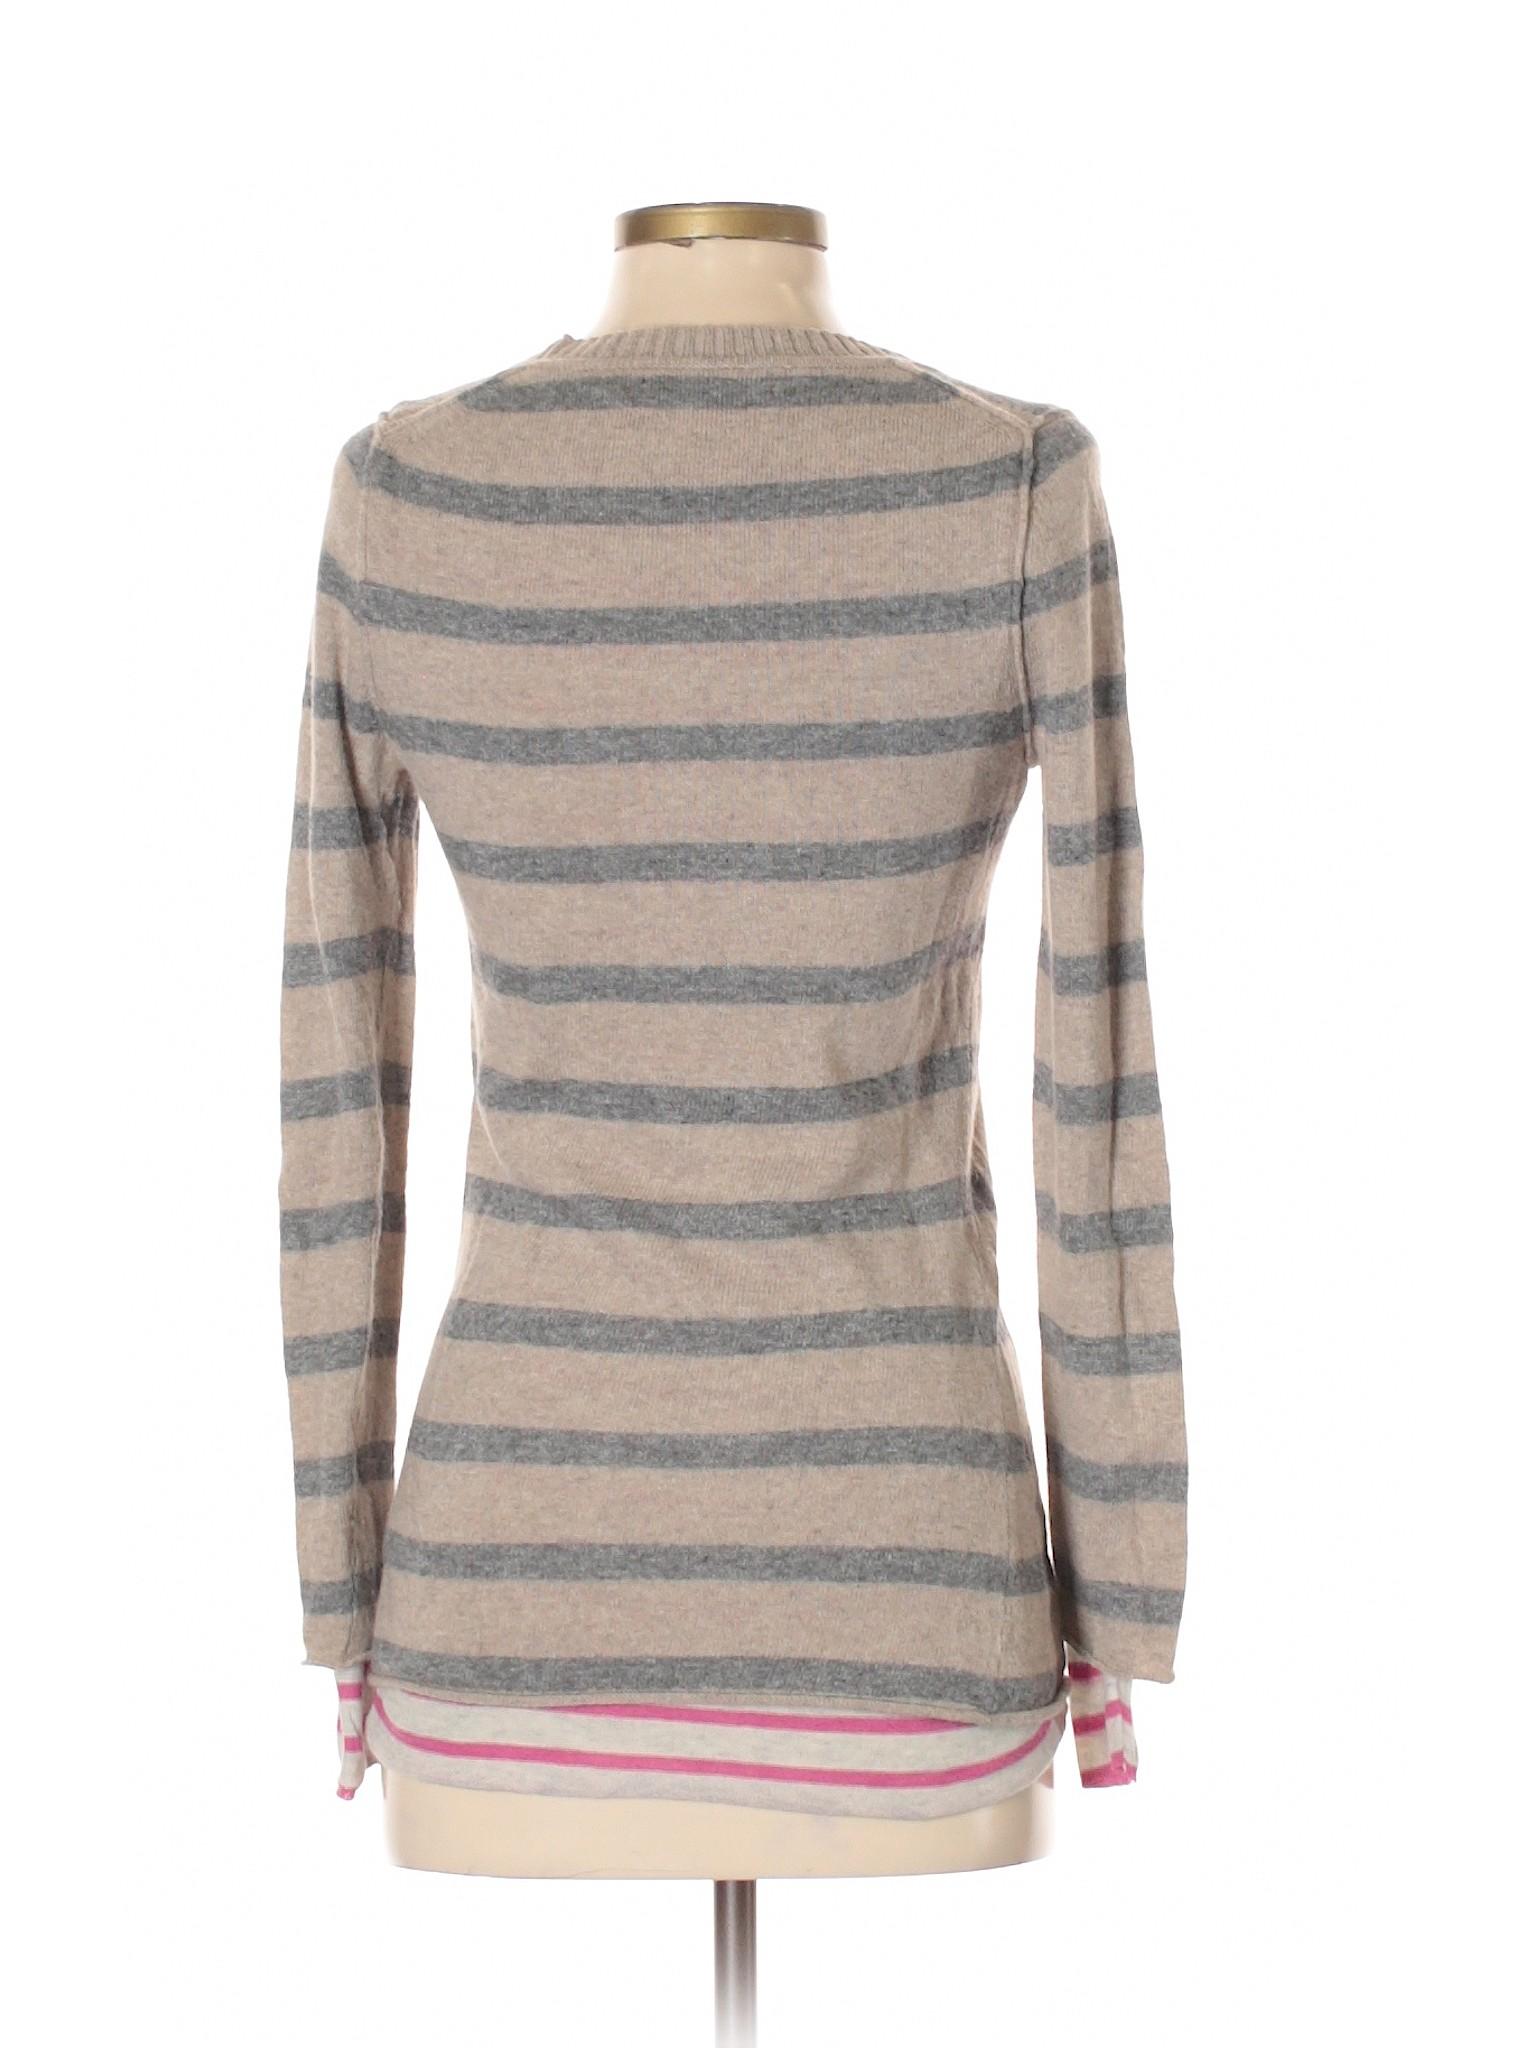 winter Republic Sweater Pullover Boutique Banana 1Y6wZzzB